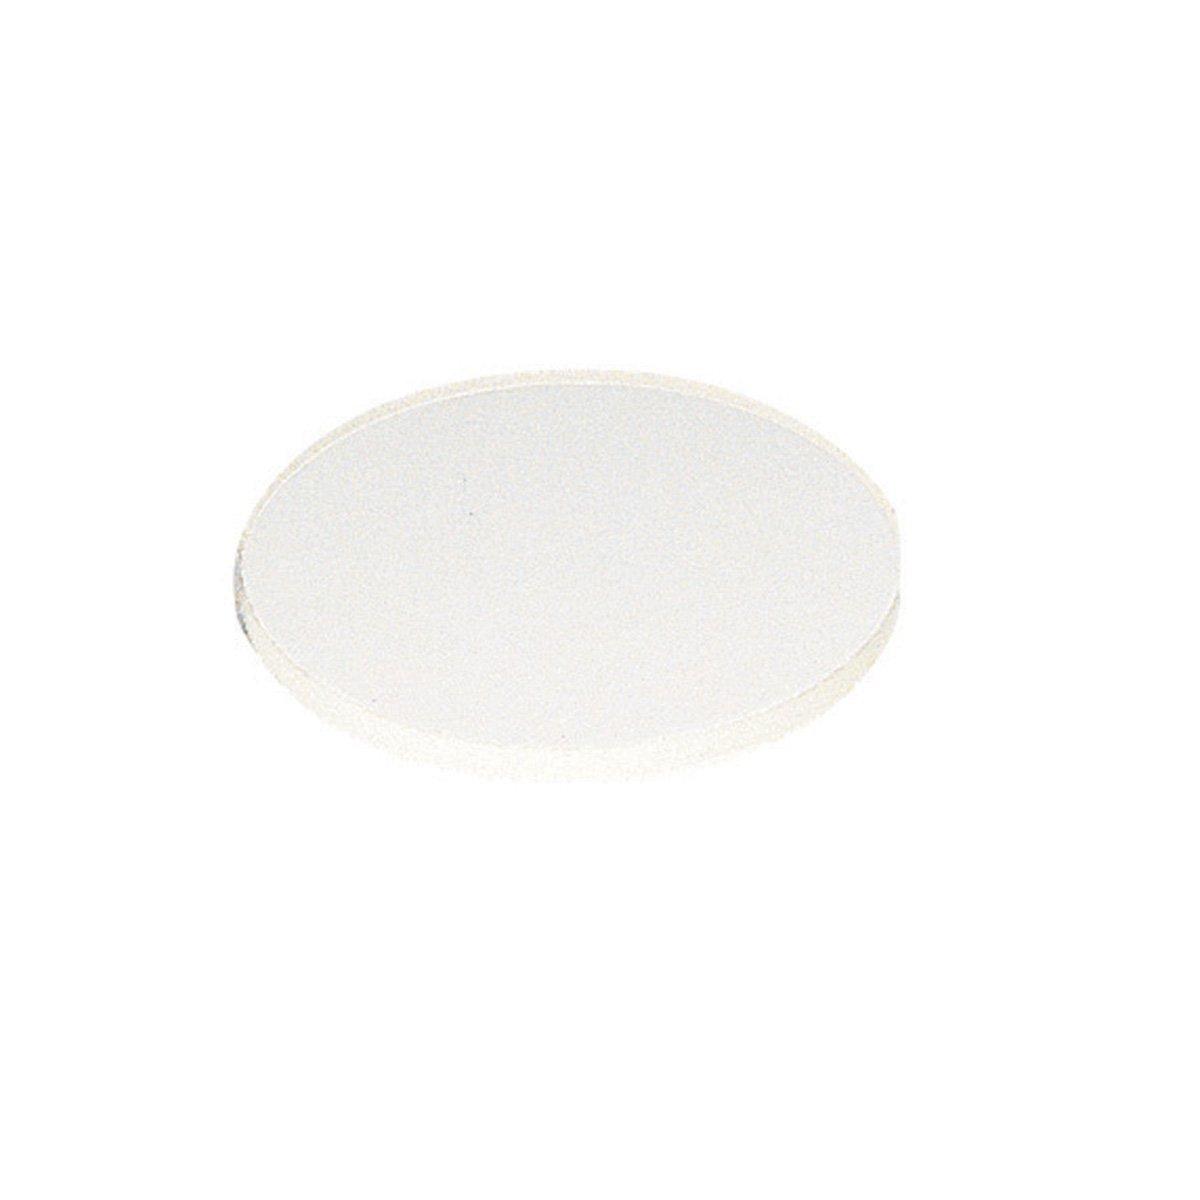 Amazon.com: WAC Lighting LENS-16-UVF Uv Filter Lens for Mr16 ...